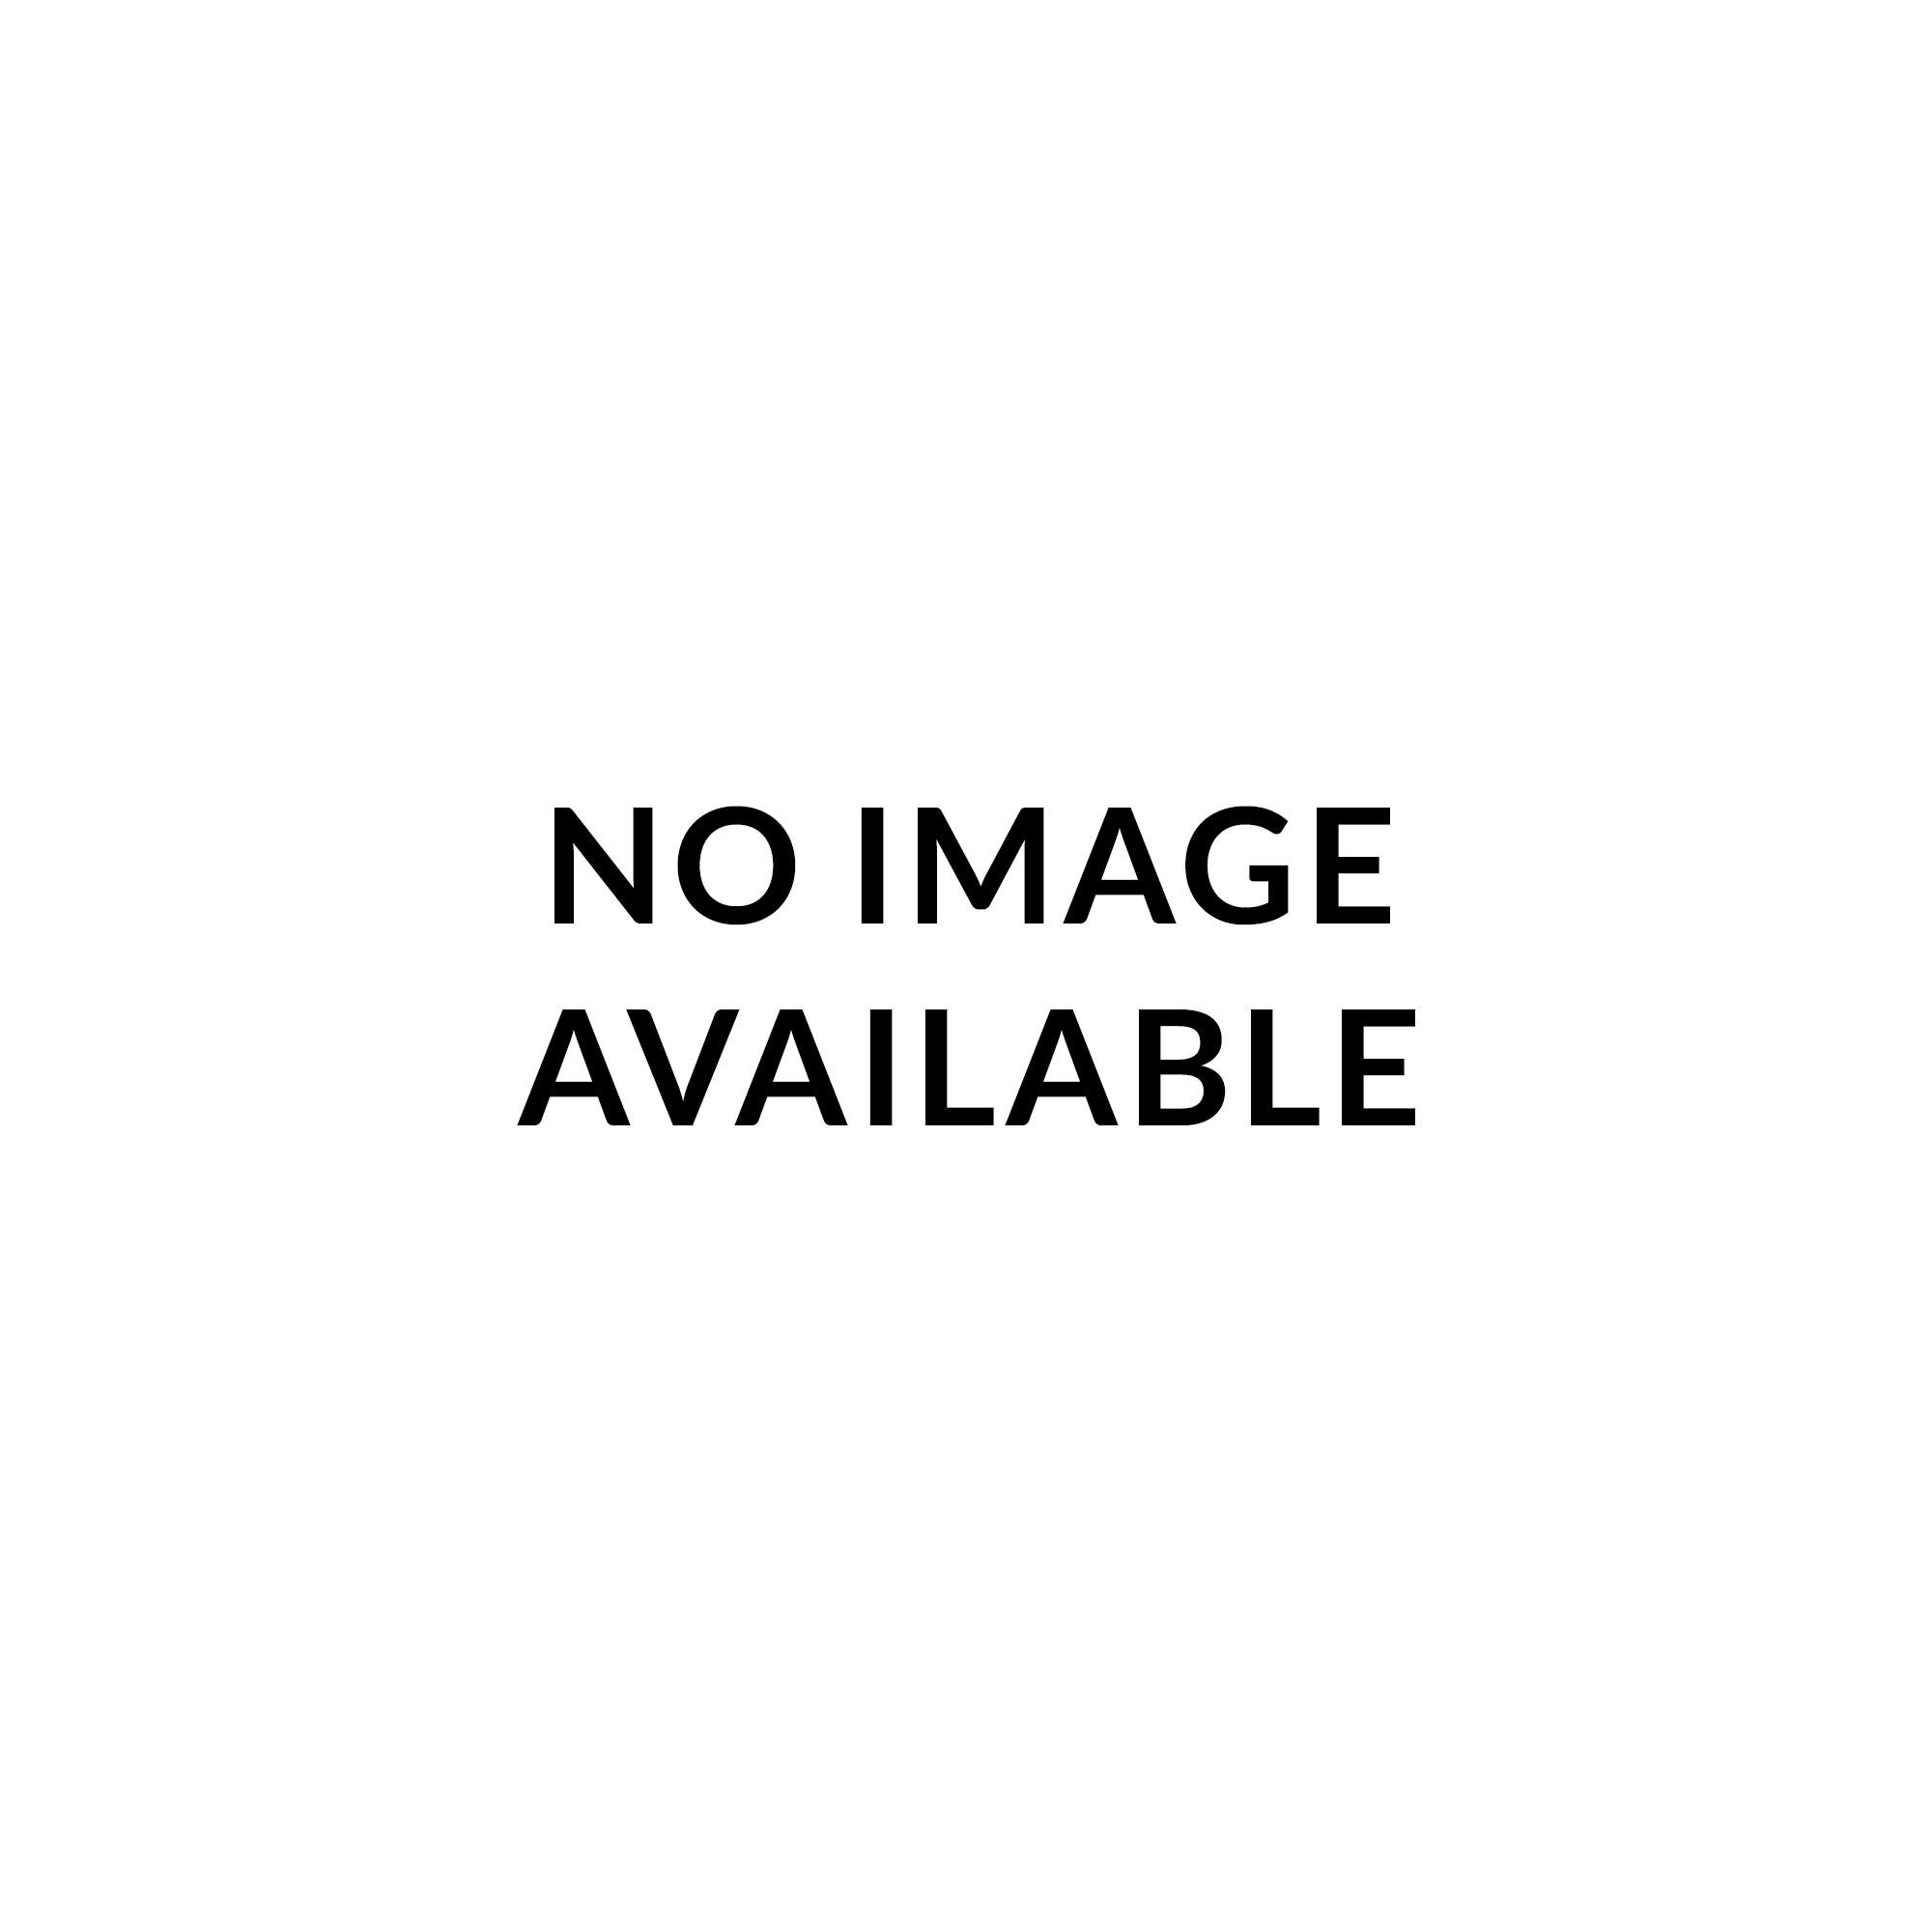 D'Addario PSB130SL ProSteels XL Bass Single String .130 Super Long Scale